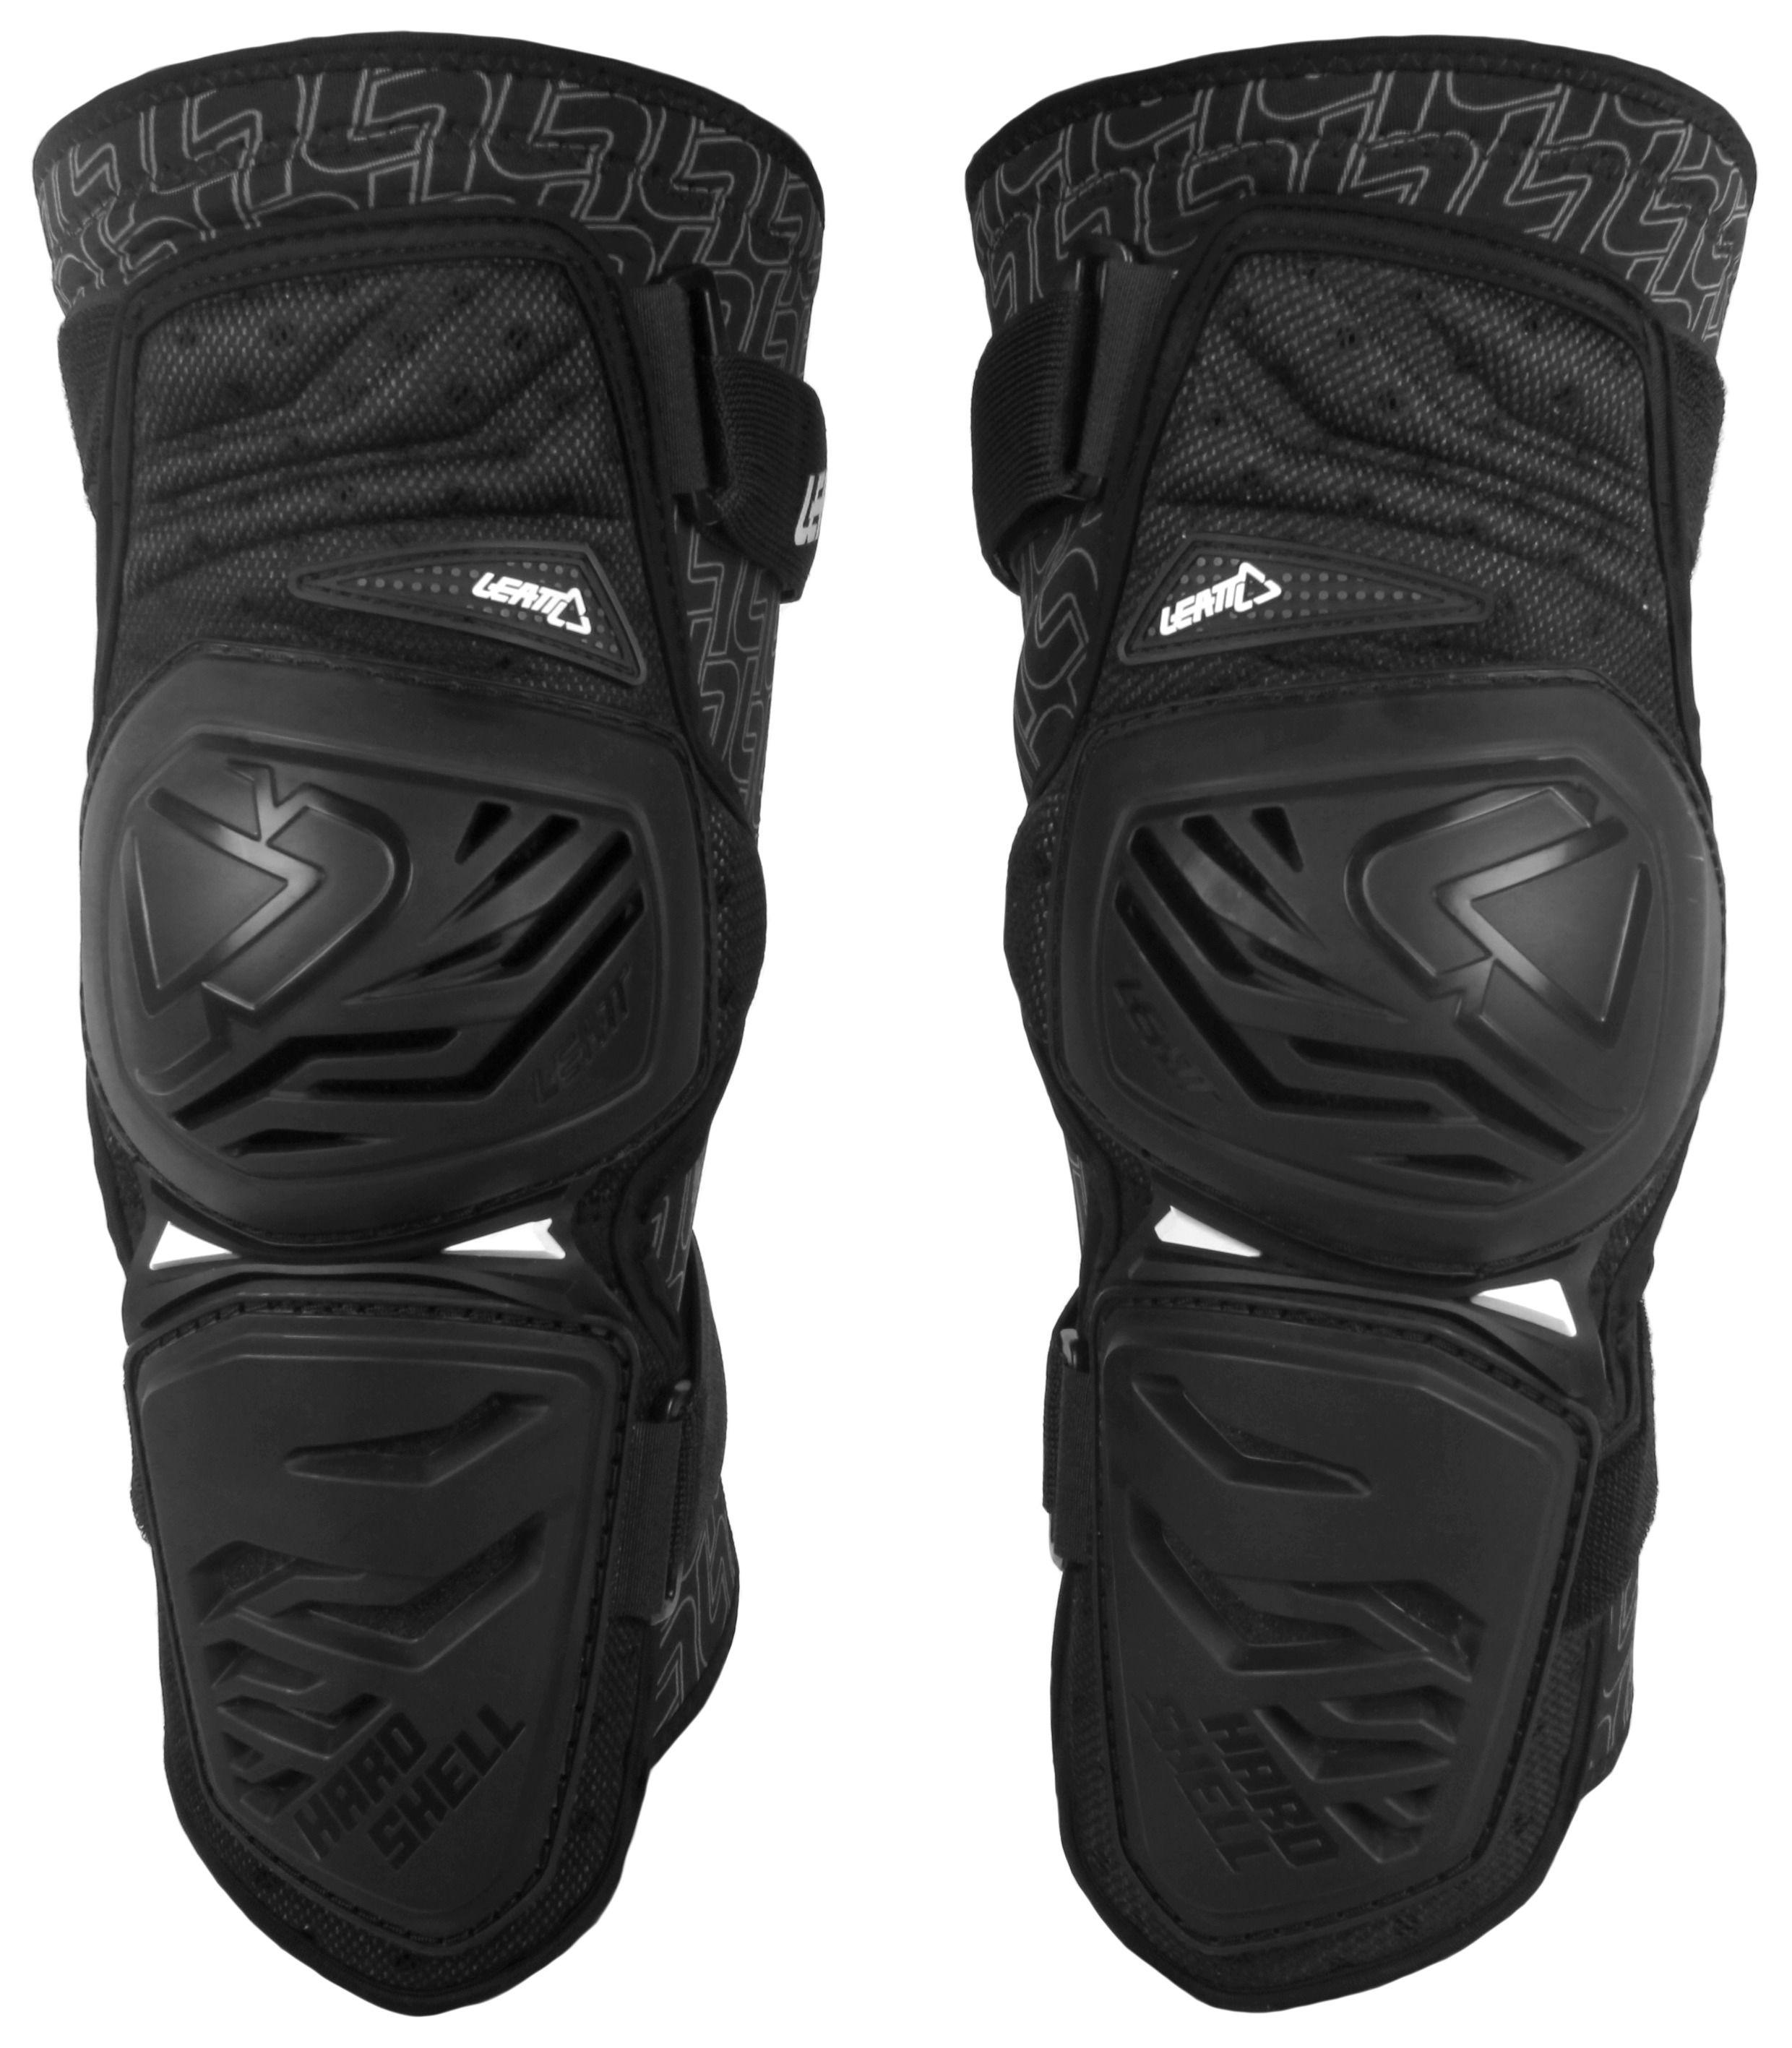 Dirt Bike Snowmobile >> Leatt Enduro Knee Guards - RevZilla